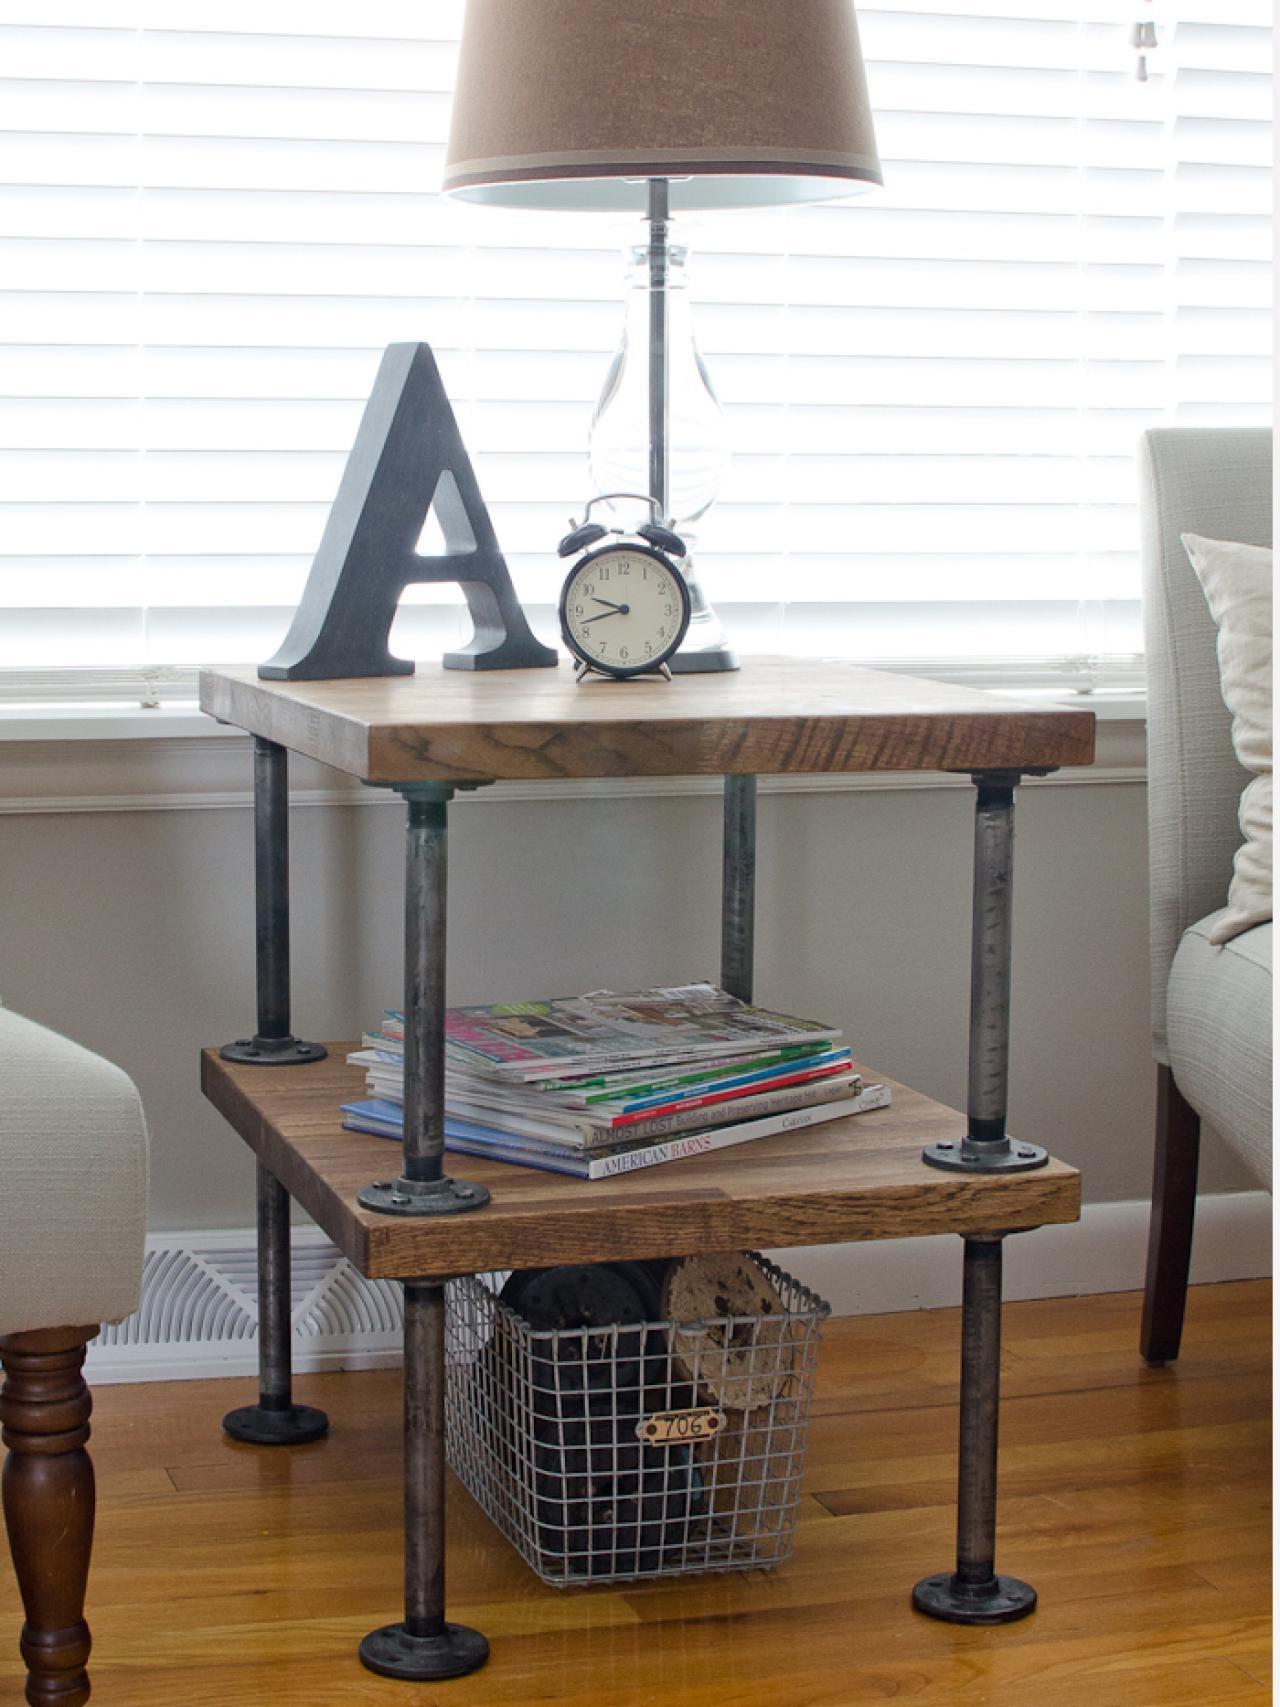 Beau Small Table With Shelf